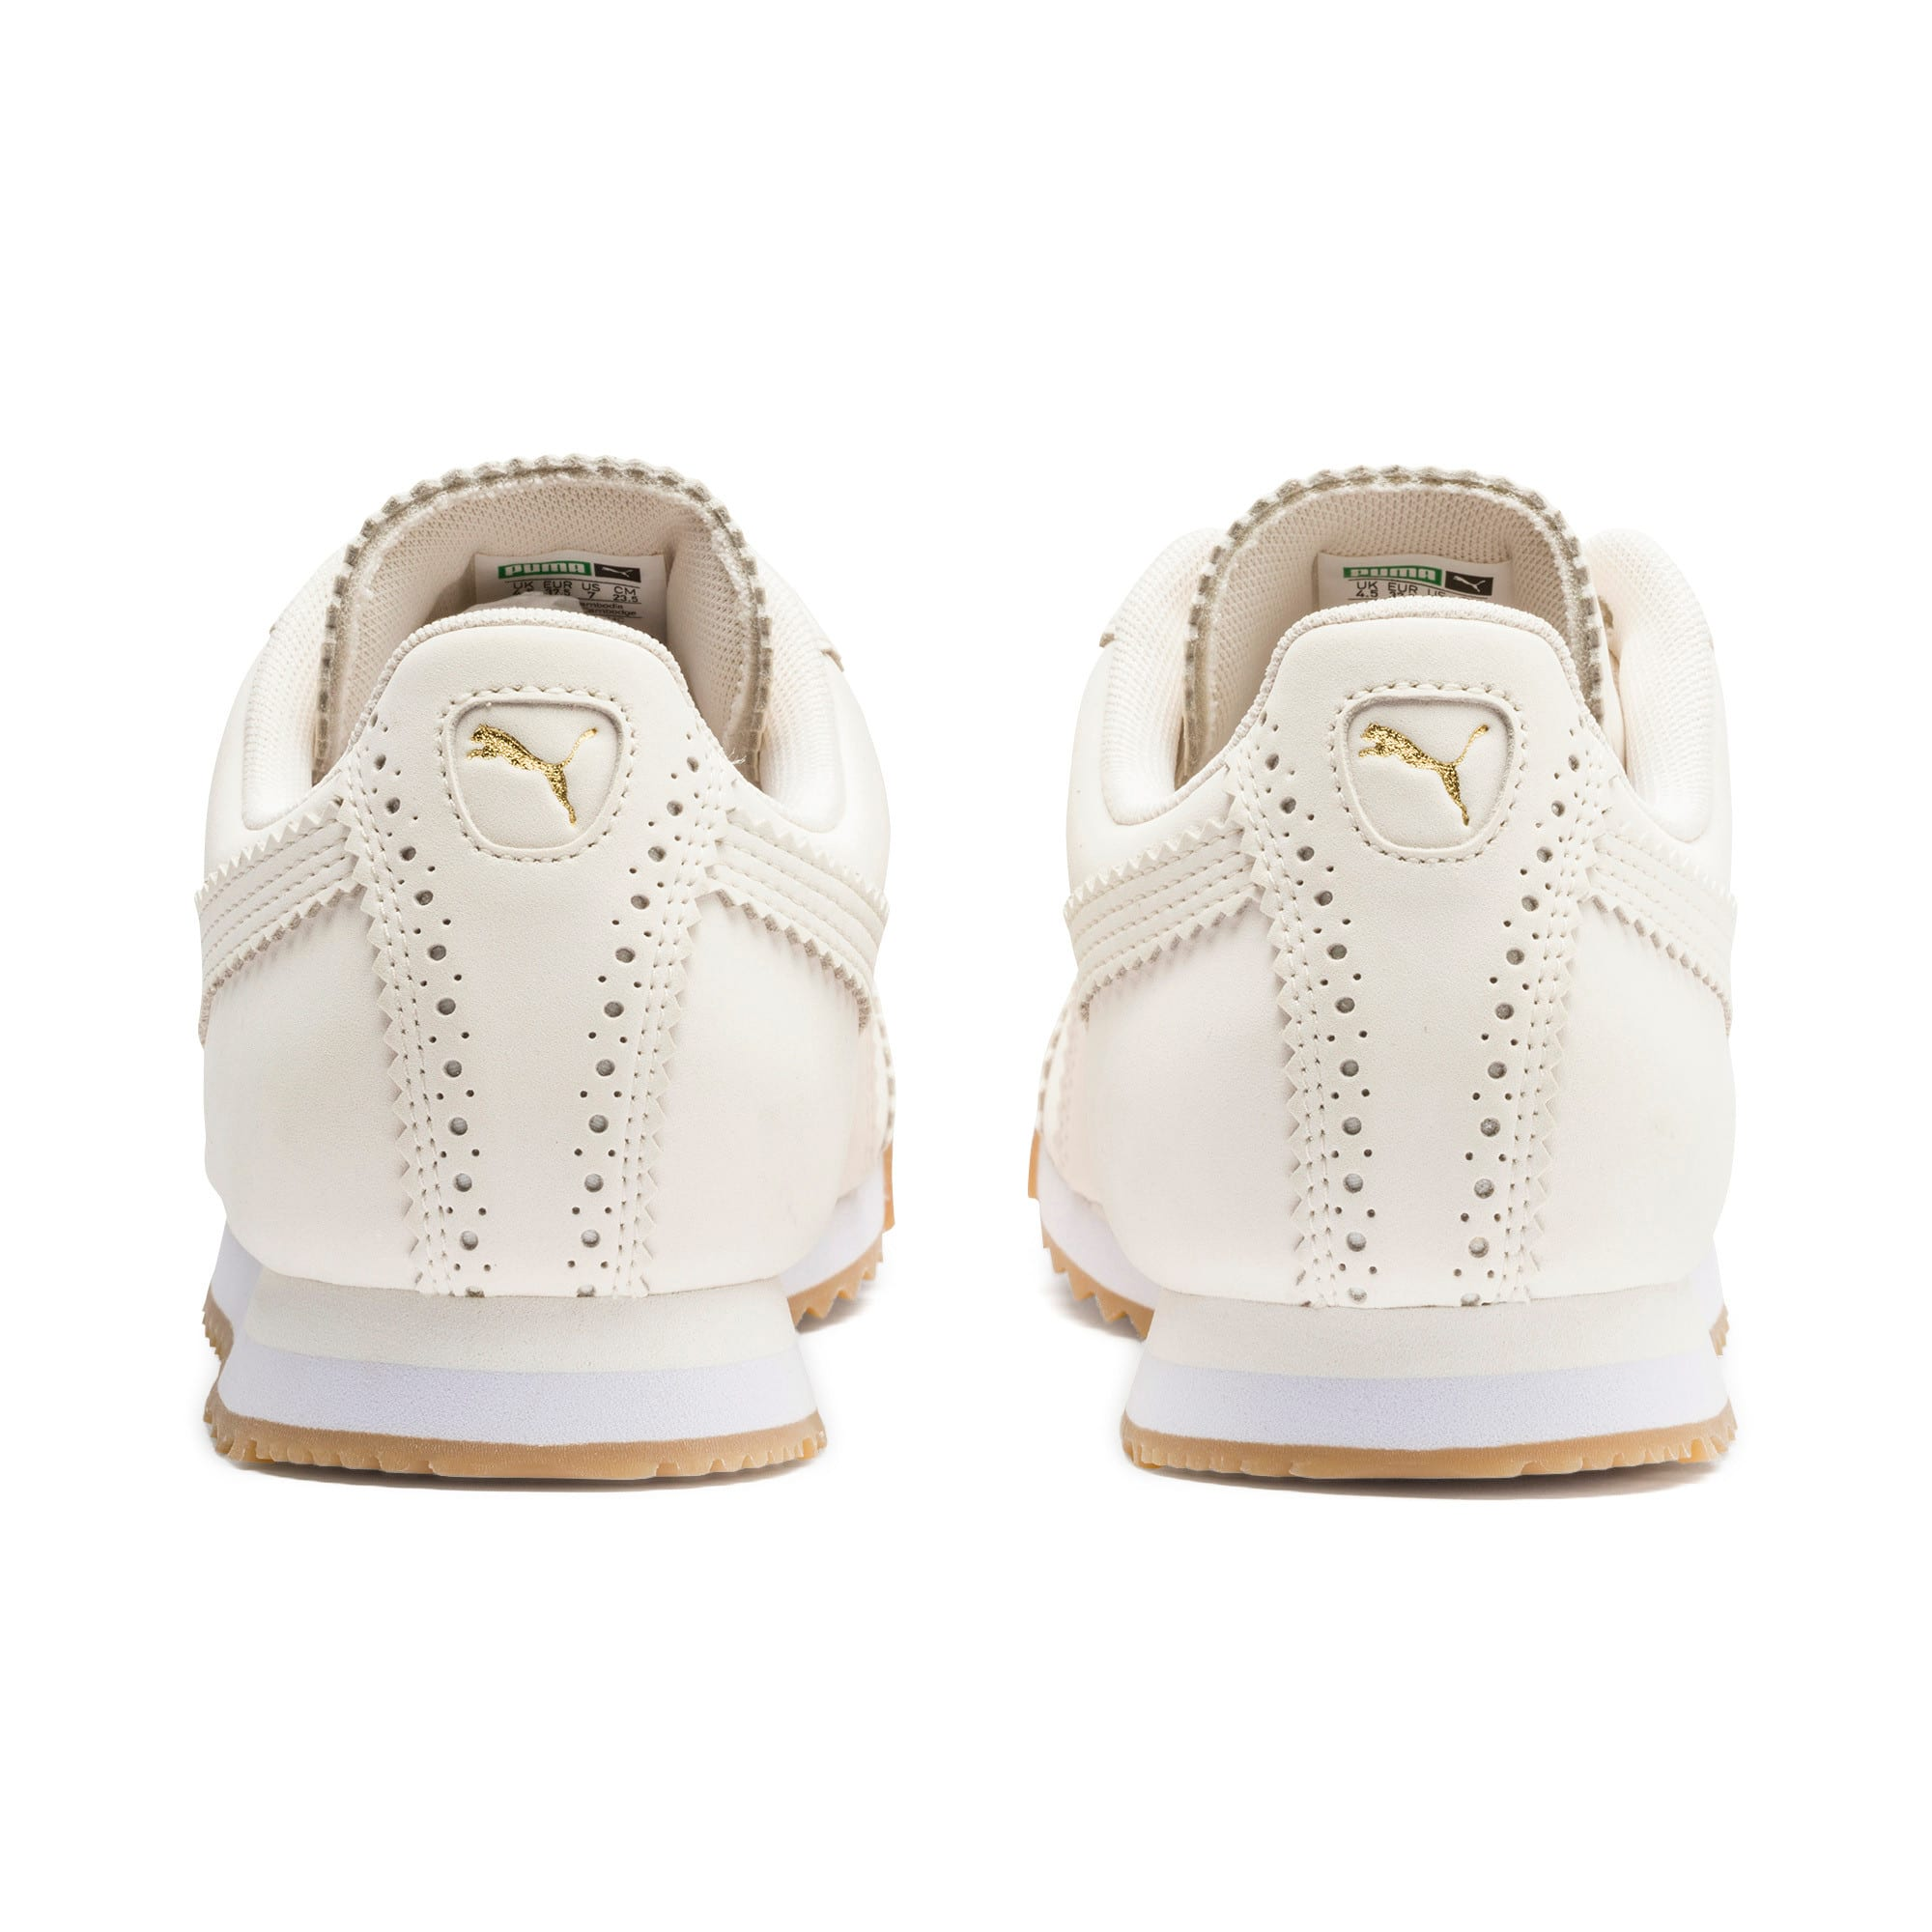 Thumbnail 5 of Roma Brogue Women's Sneakers, Pastel Parchment-P.Team Gold, medium